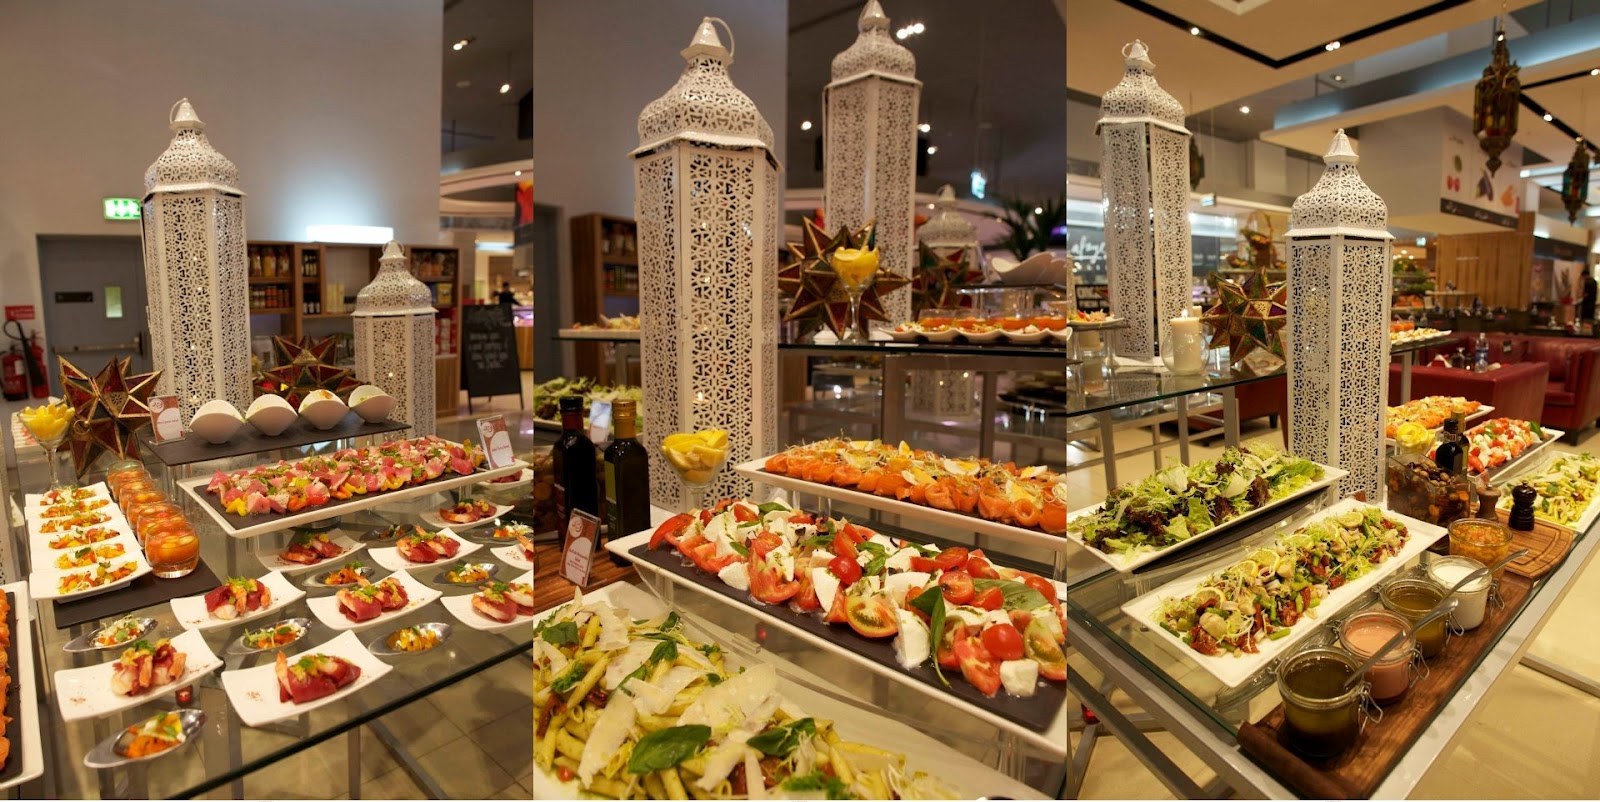 Grab Ramadan Iftar Buffet Deals Online In Dubai